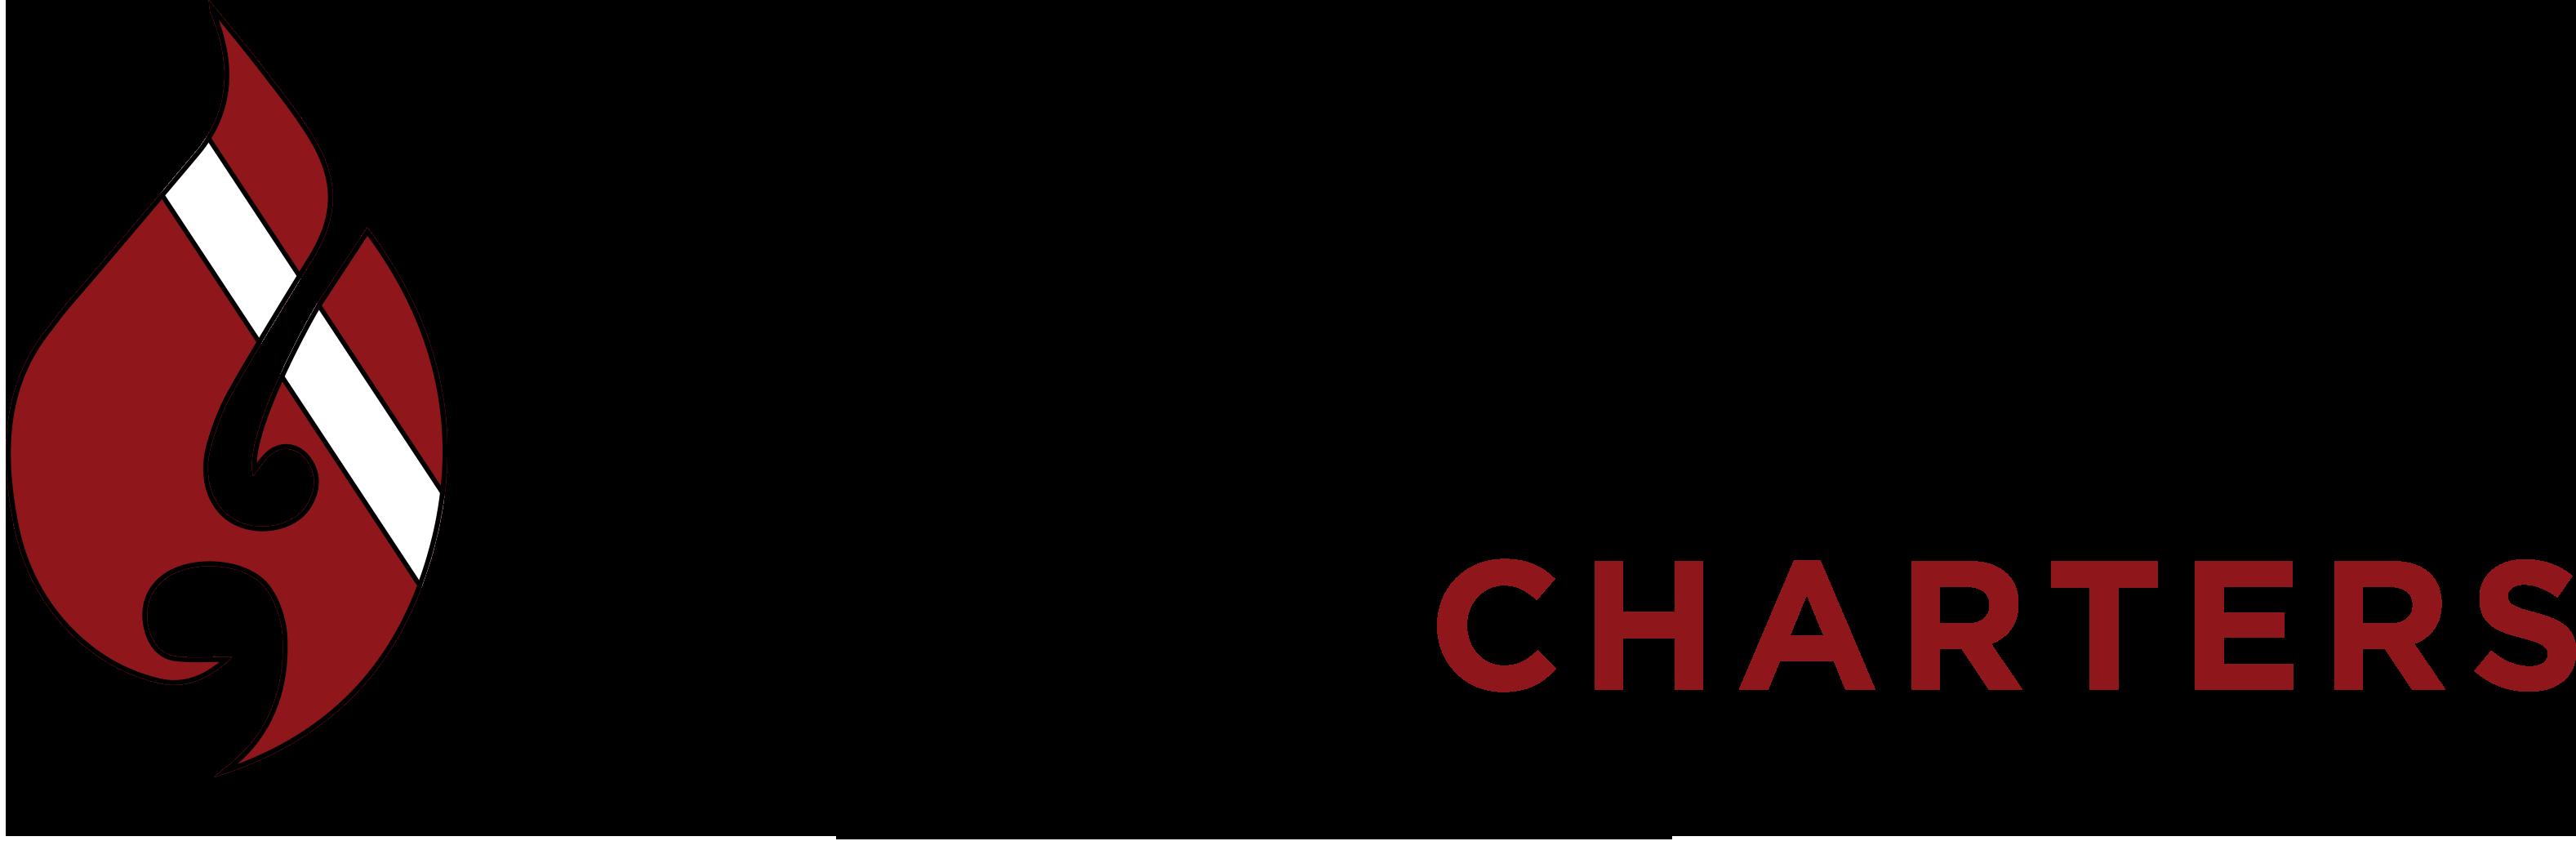 Kyalami Charters -